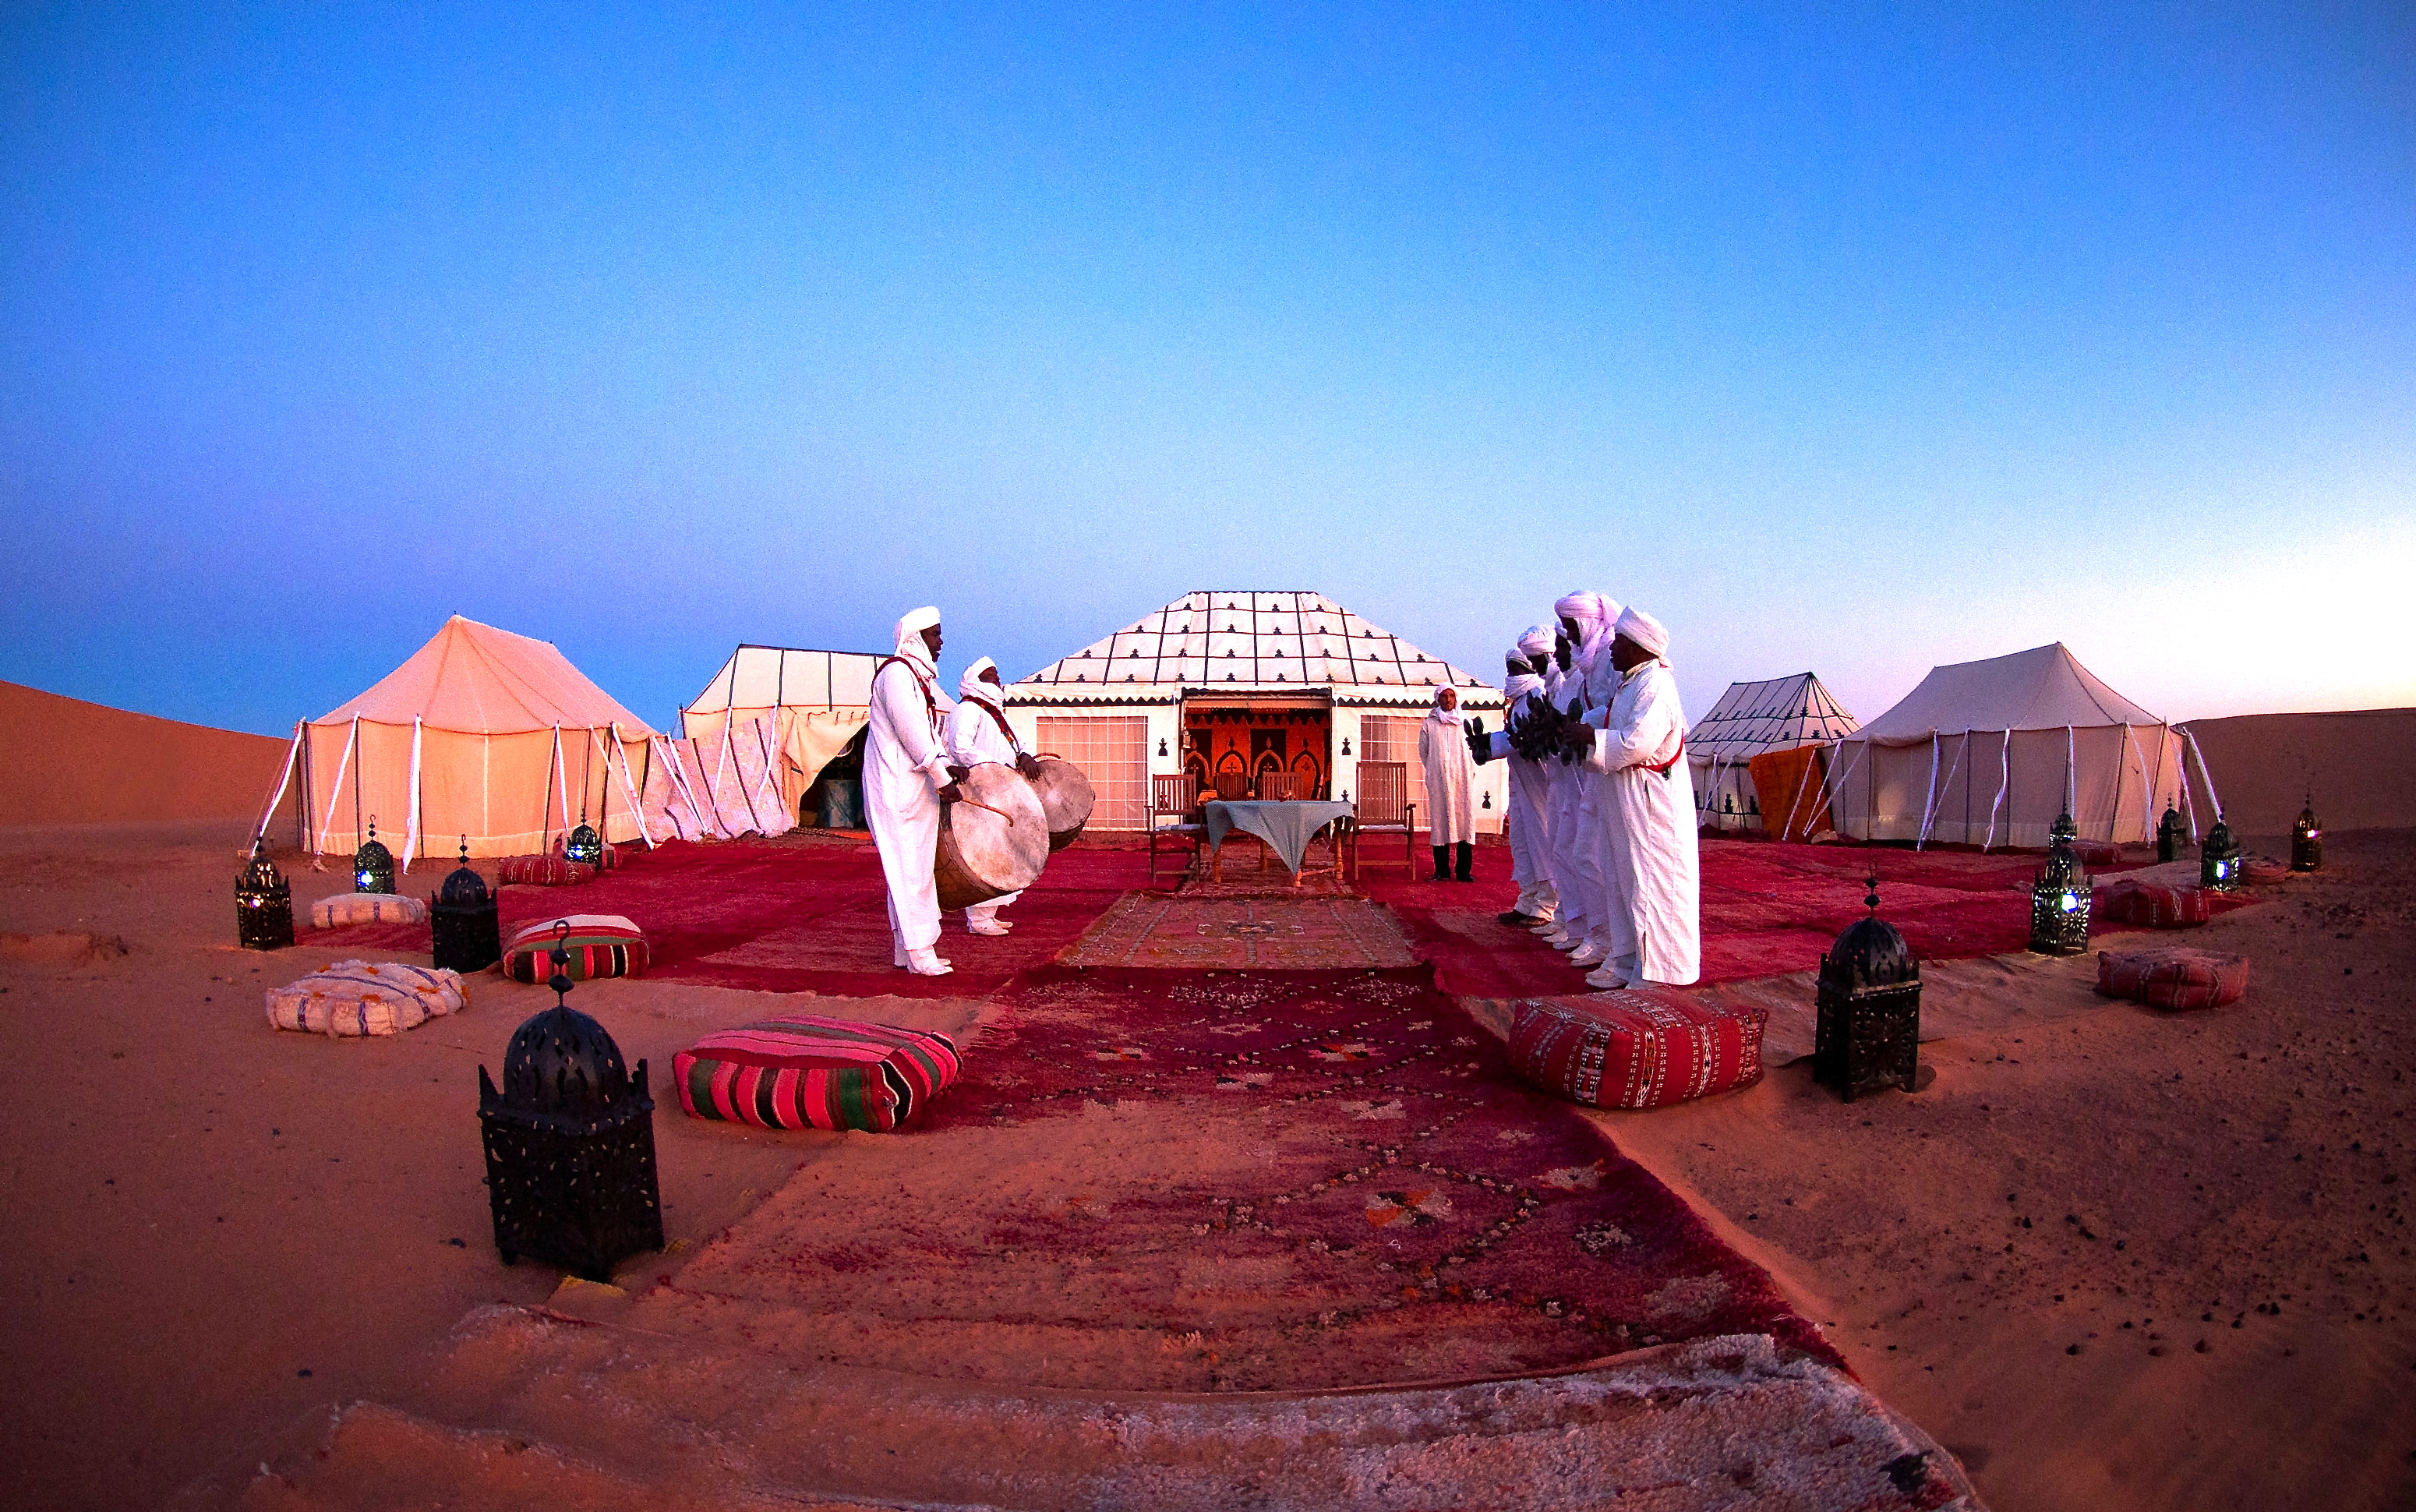 Luxury Desert Camp Merzouga Your Morocco Tour Guide Morocco - Morocco tours